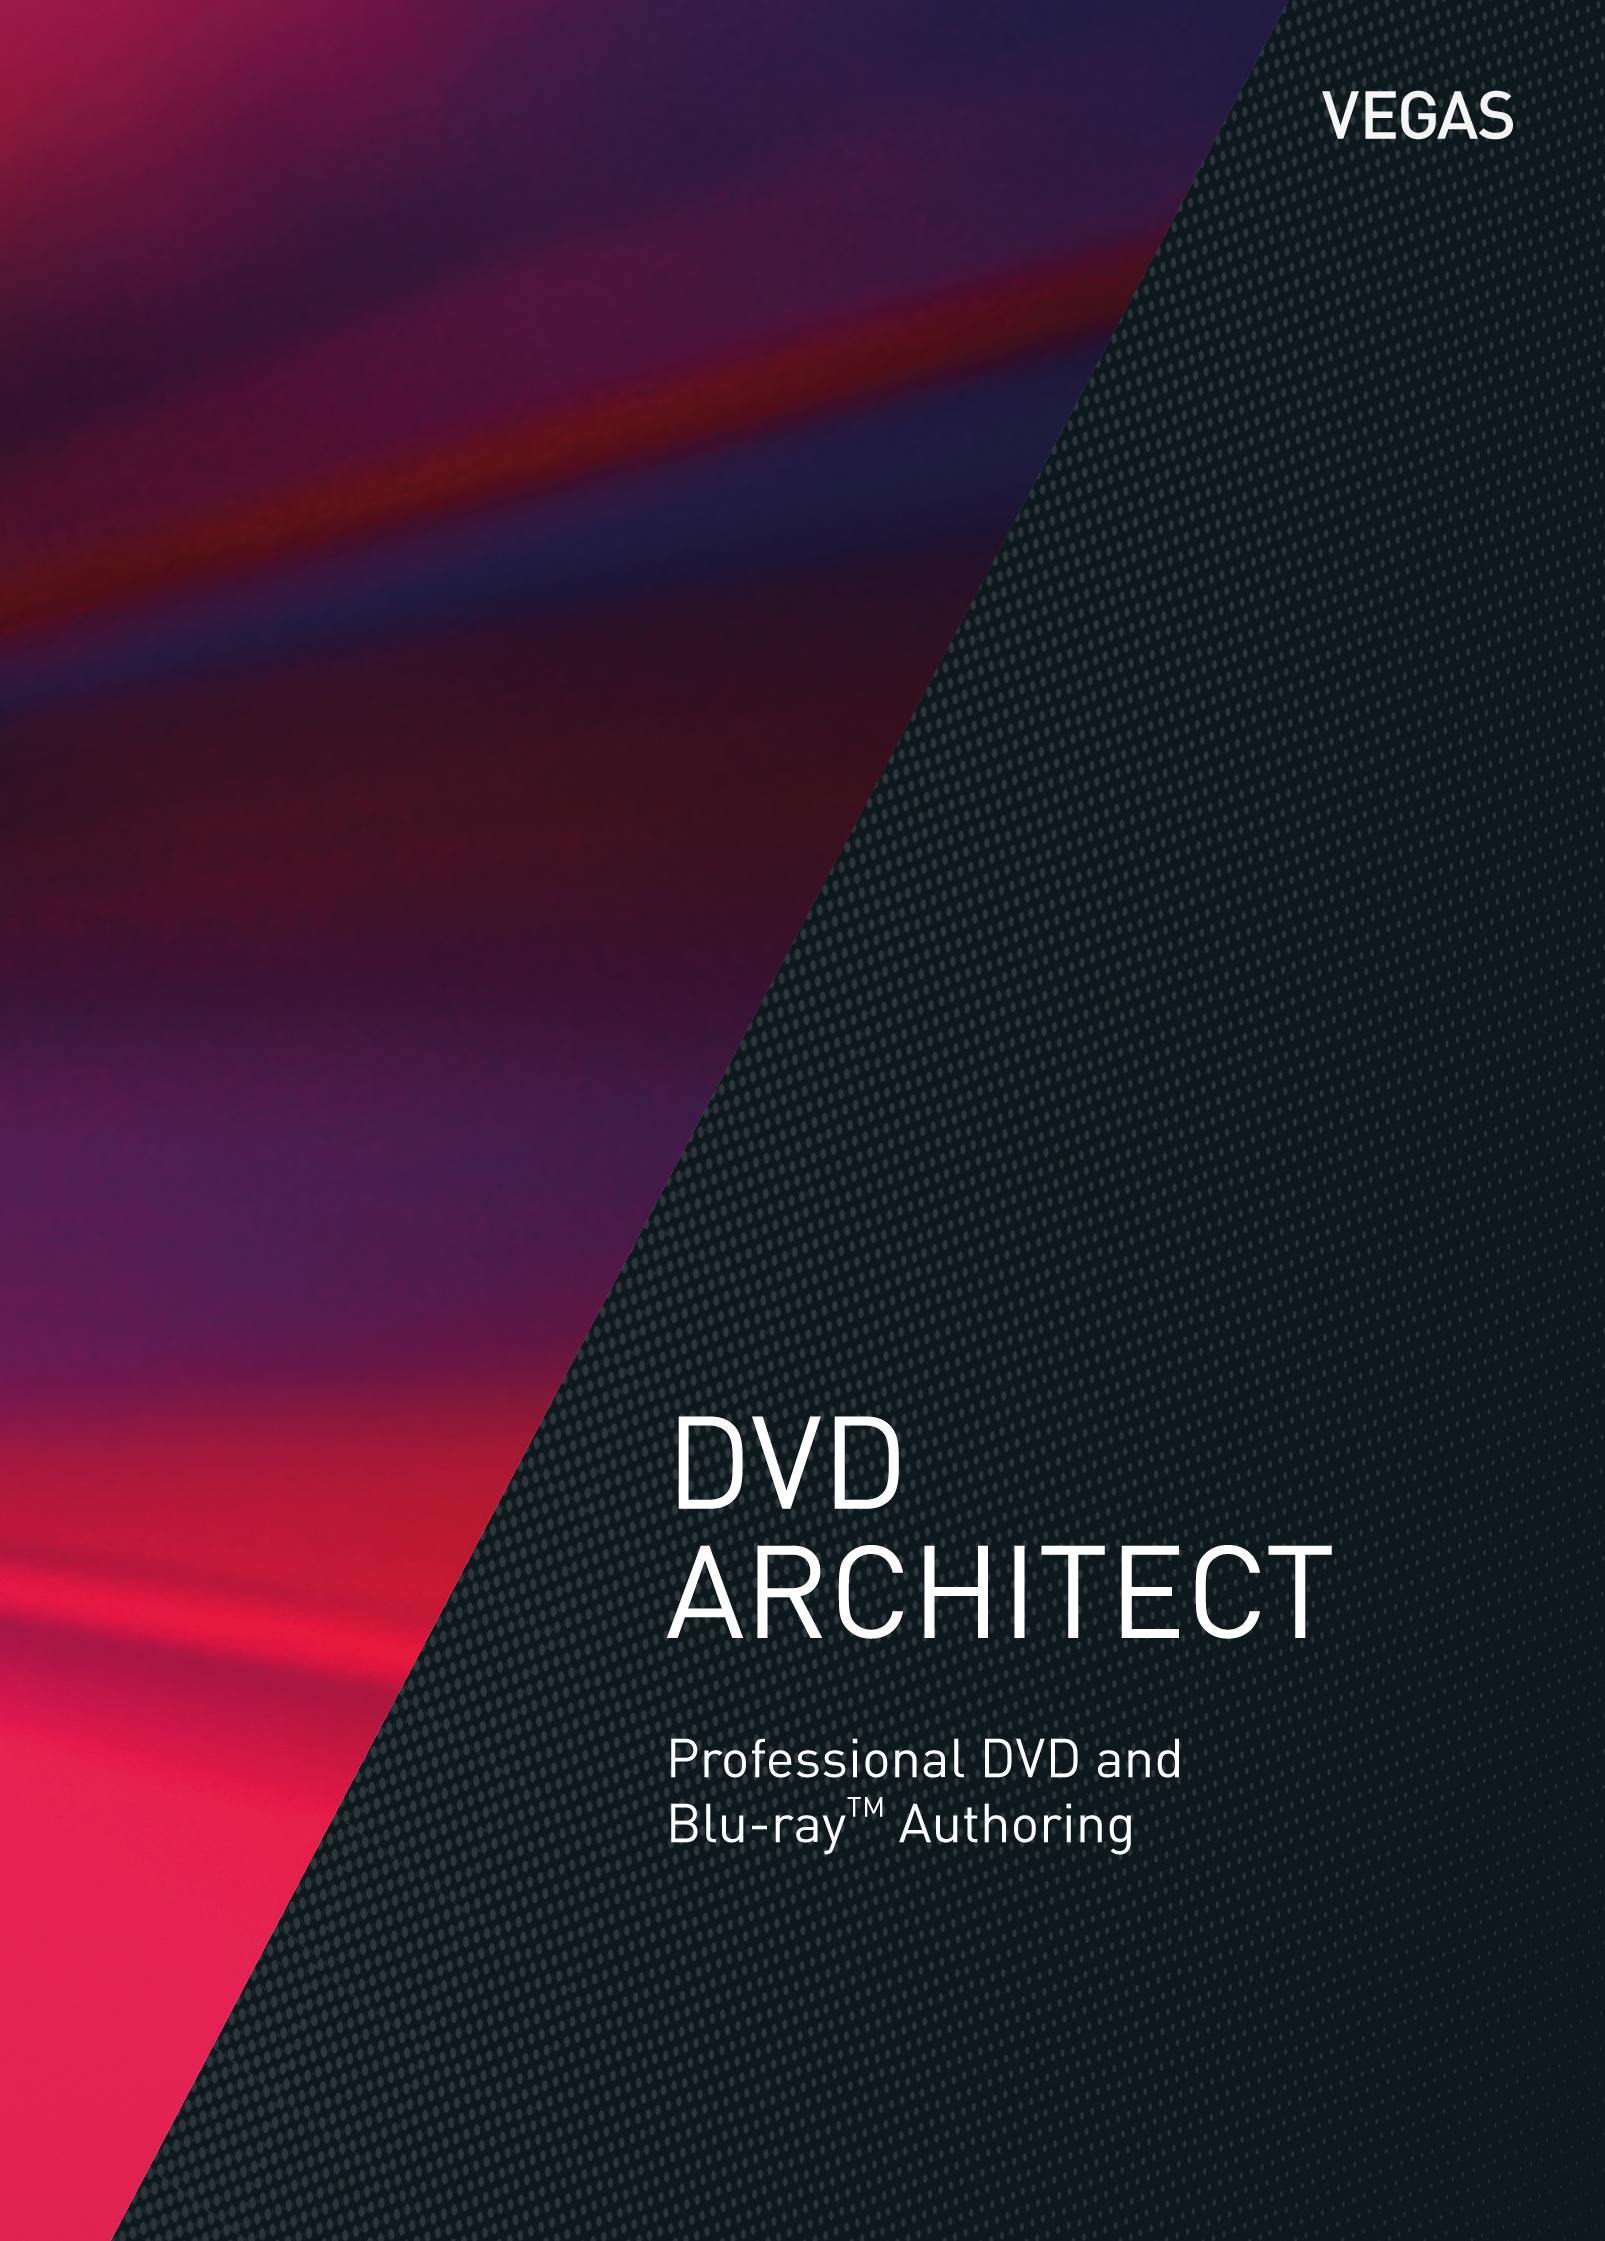 VEGAS DVD Architect [Download]